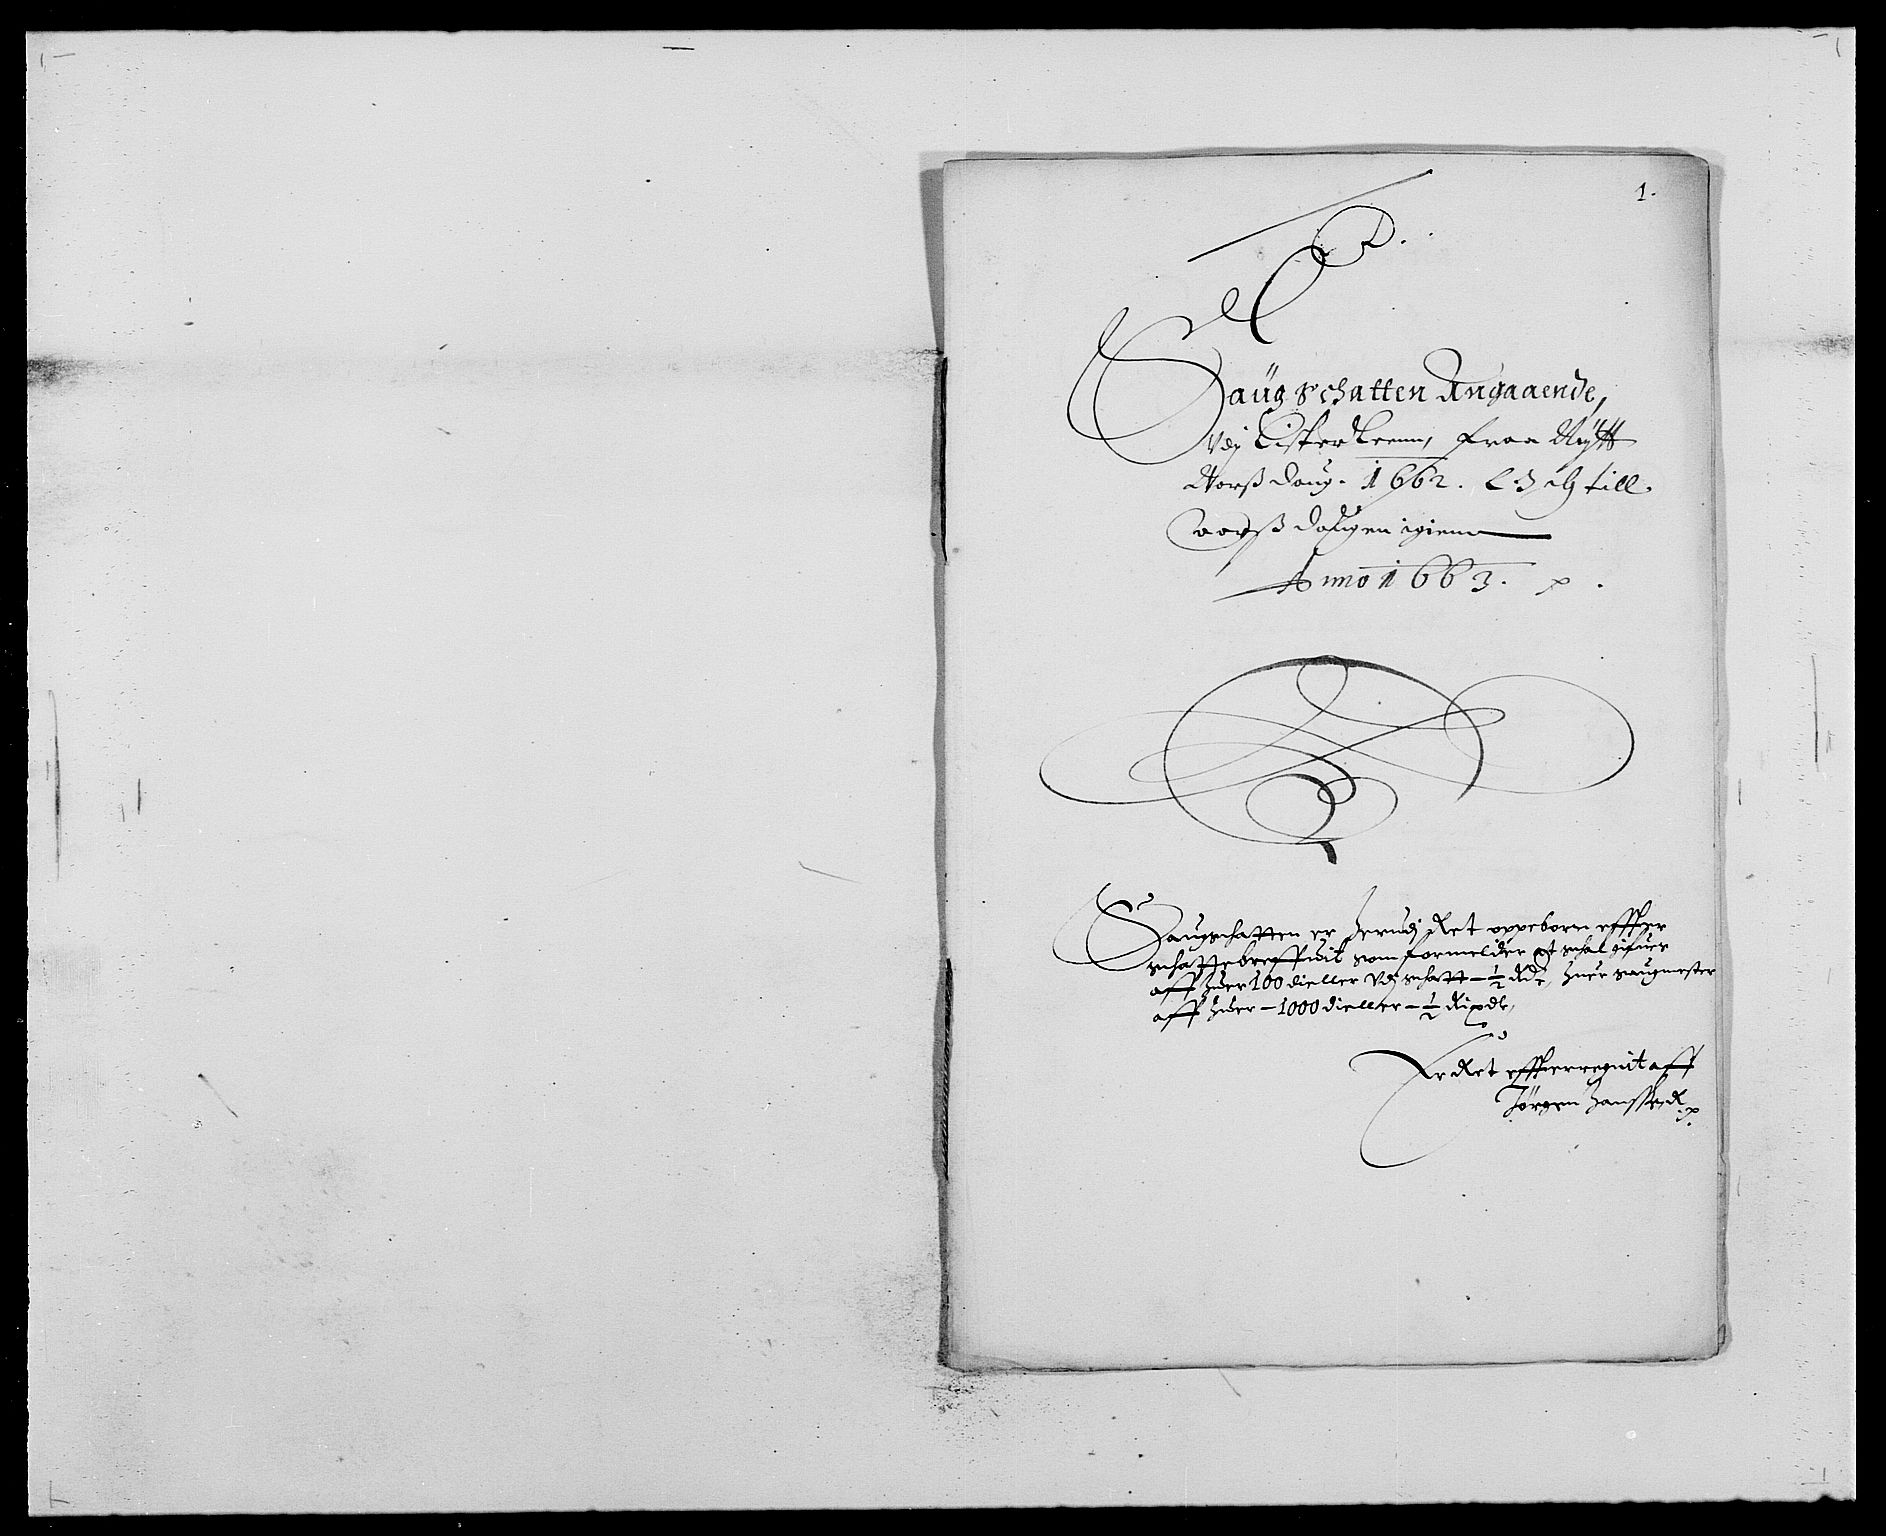 RA, Rentekammeret inntil 1814, Reviderte regnskaper, Fogderegnskap, R41/L2522: Fogderegnskap Lista, 1662, s. 332